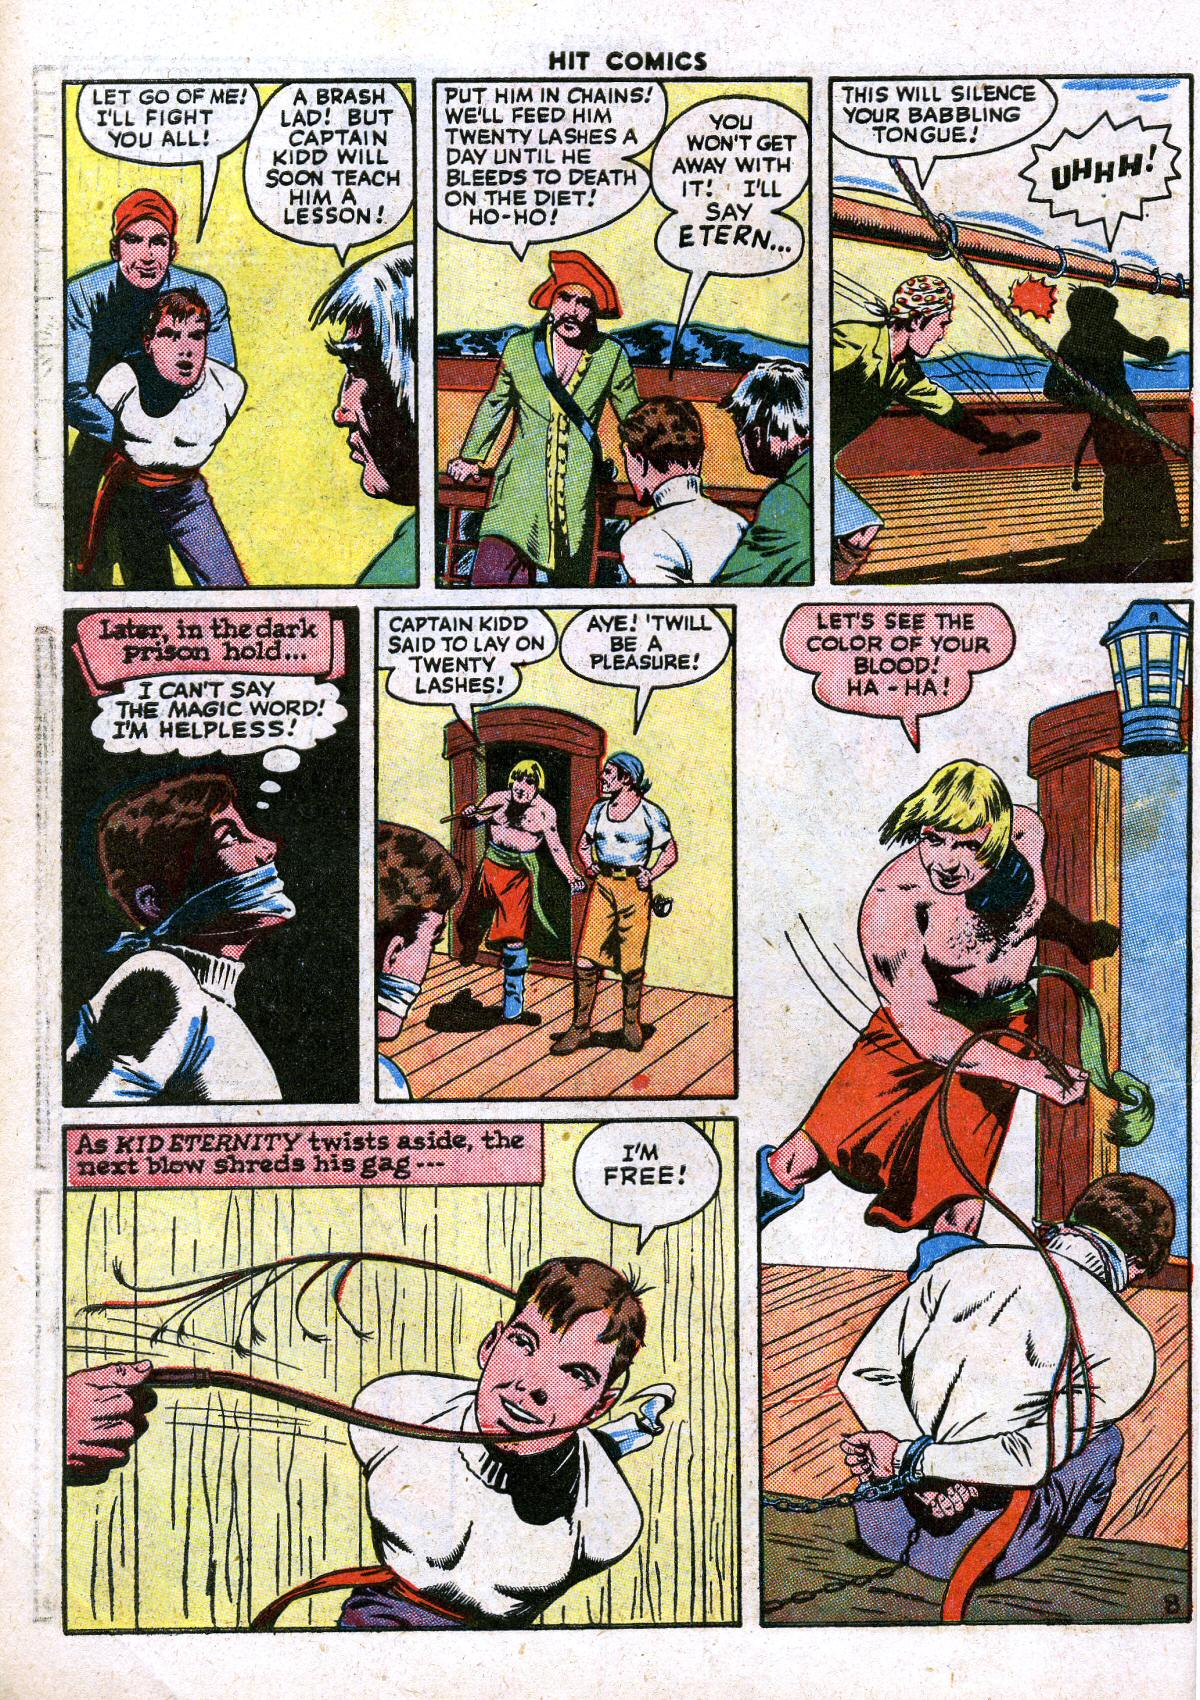 Read online Hit Comics comic -  Issue #41 - 10